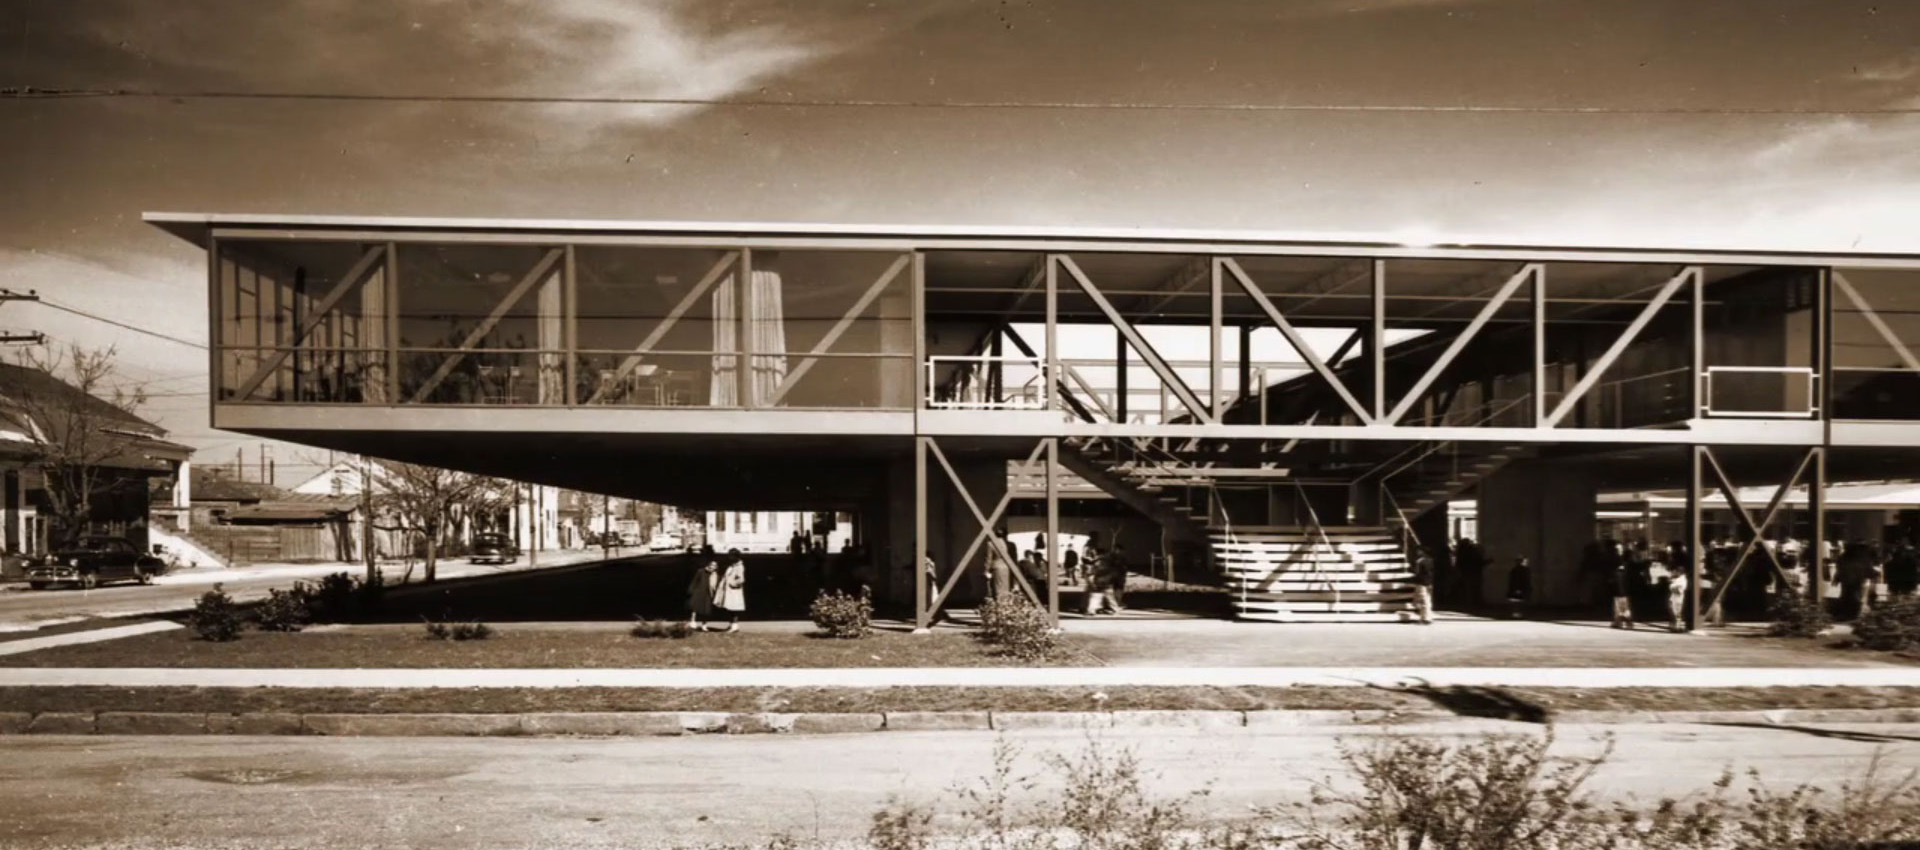 Phillis Wheatley Elementary School by Charles R. Colbert - Curtis & Davis, 1954. Photograph by Frank Lotz Miller